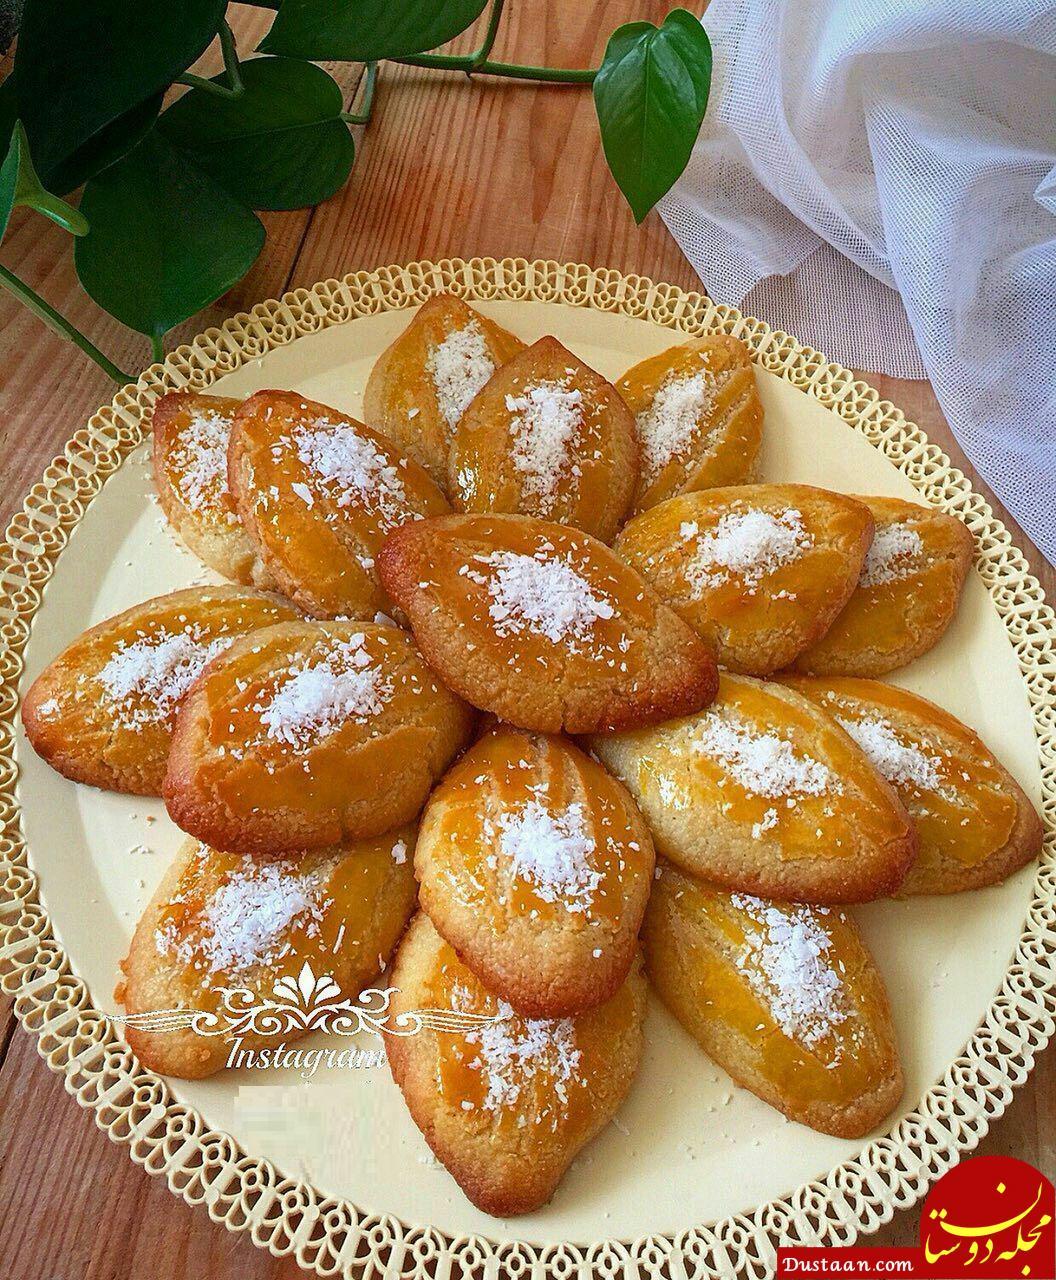 www.dustaan.com طرز تهیه شیرینی شکر پاره به سبکی خوشمزه و متفاوت